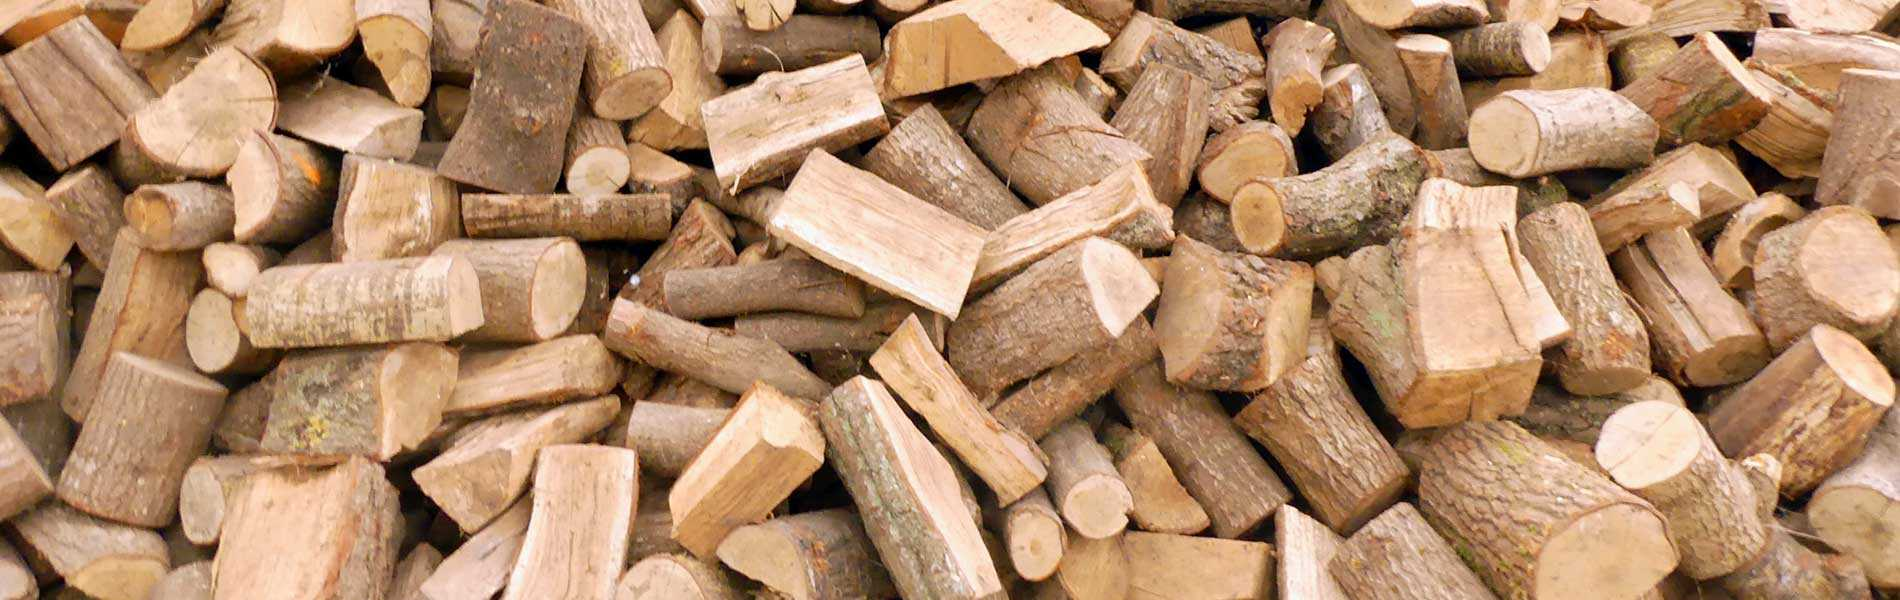 Header Image for: Firewood Logs for Sale